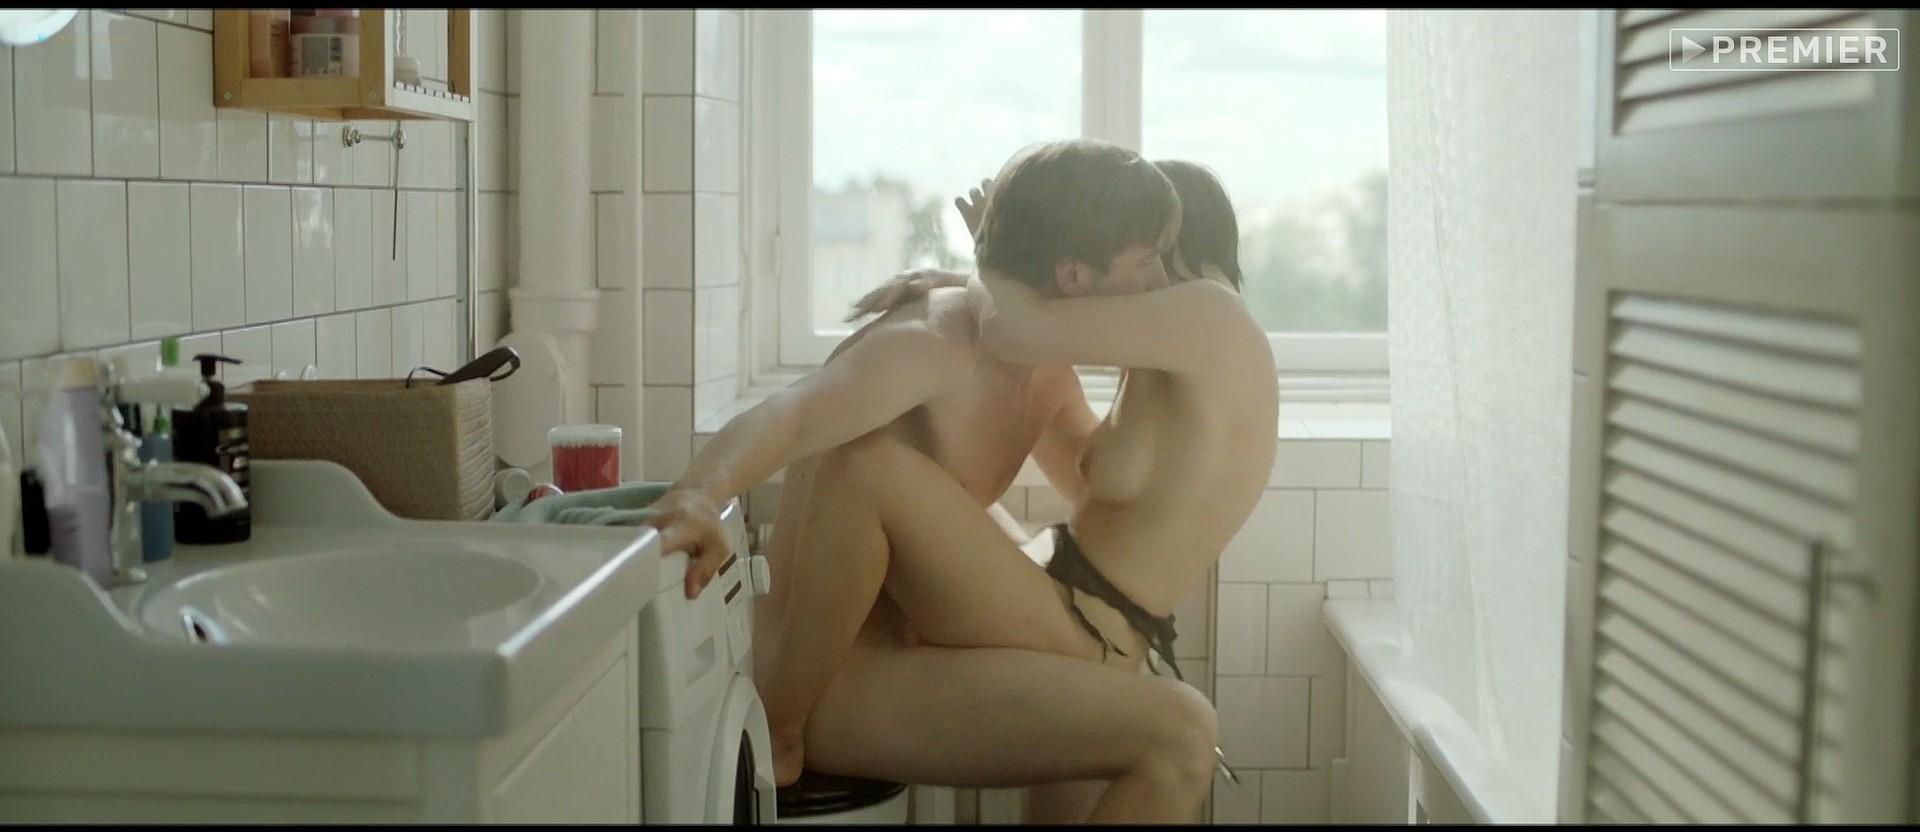 Evgeniya Gromova nude full frontal explicit blow job too - Fidelity (RU-2019) HD 1080p Web (6)